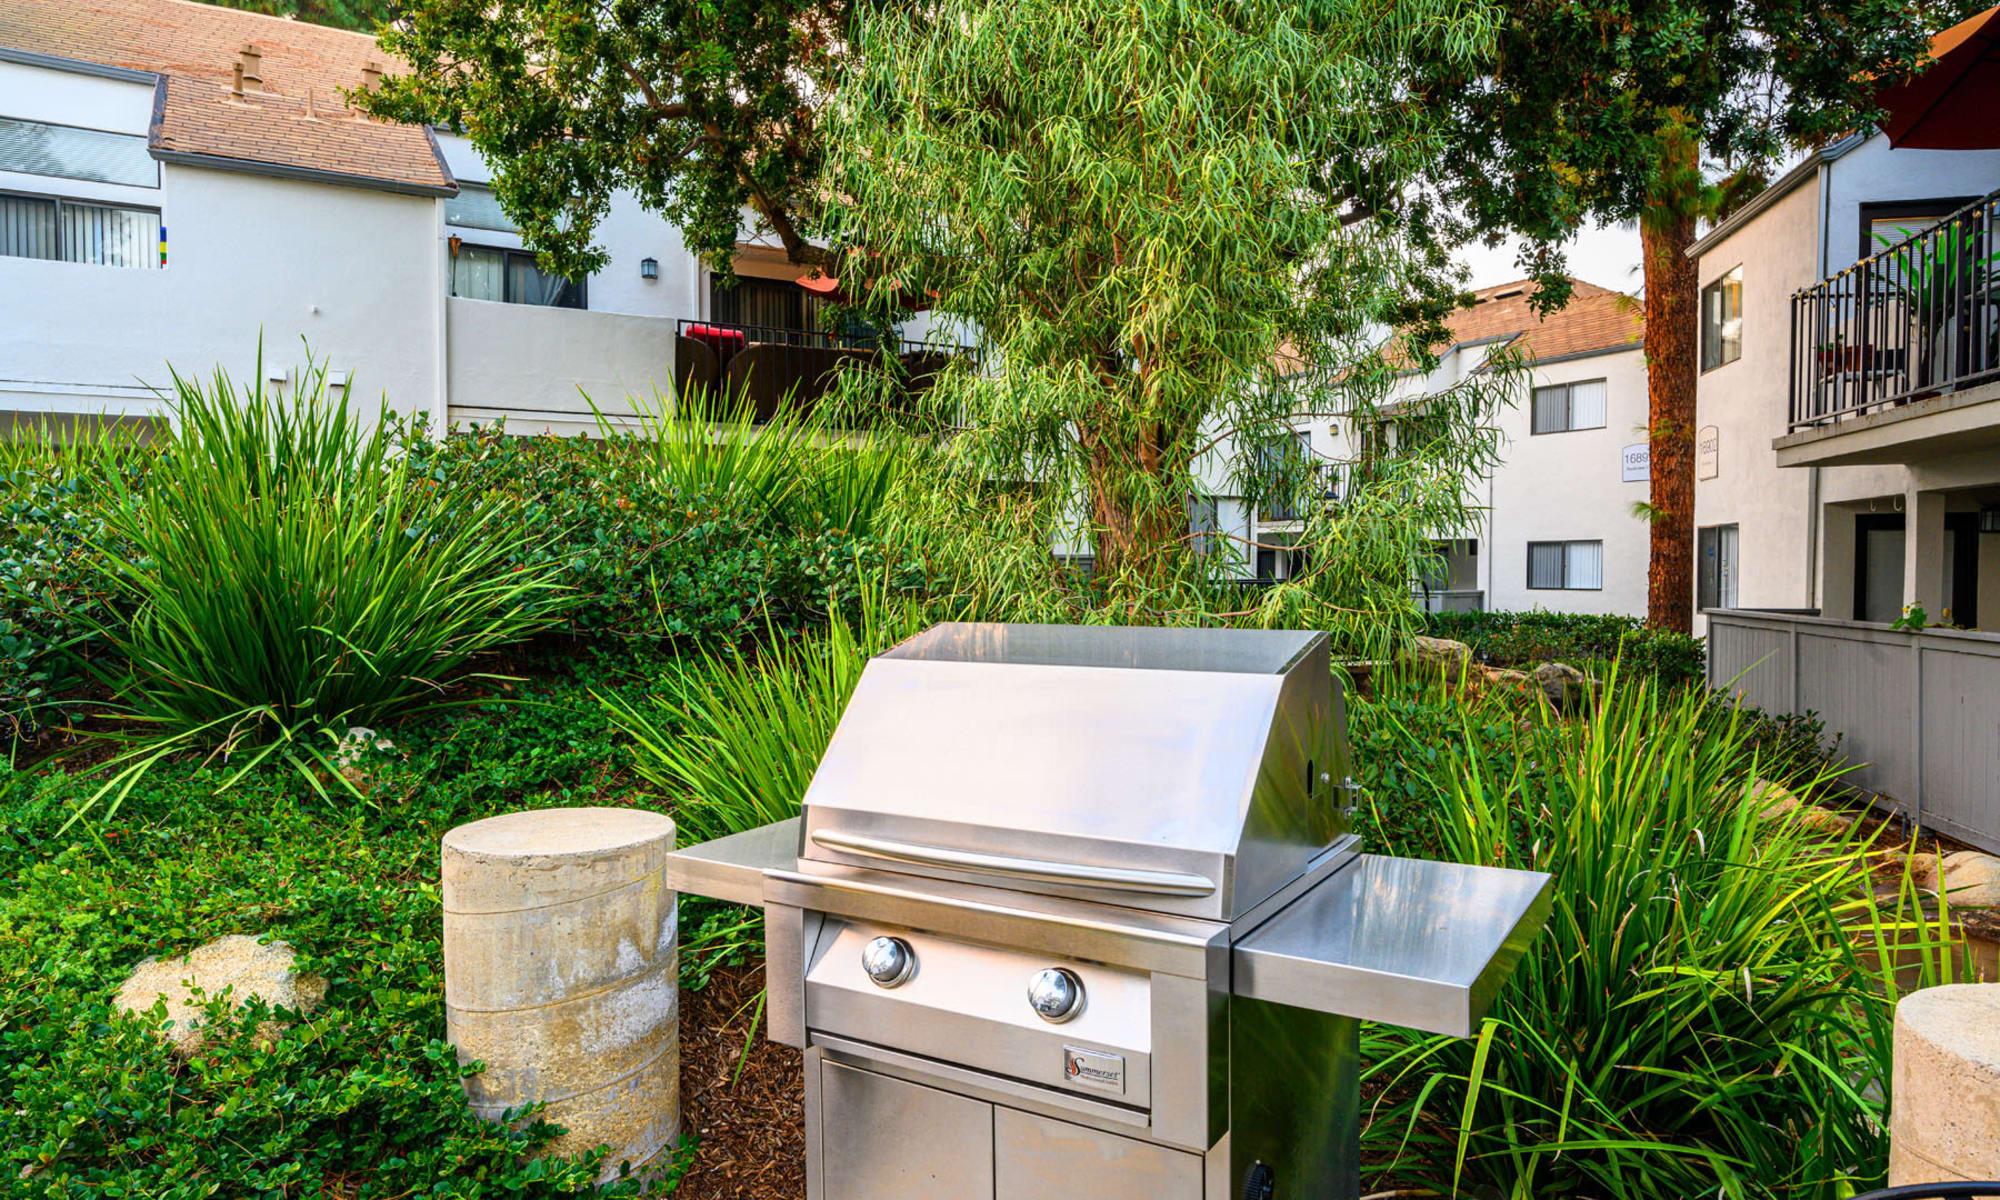 Barbecue area with a gas grill at Sendero Huntington Beach in Huntington Beach, California